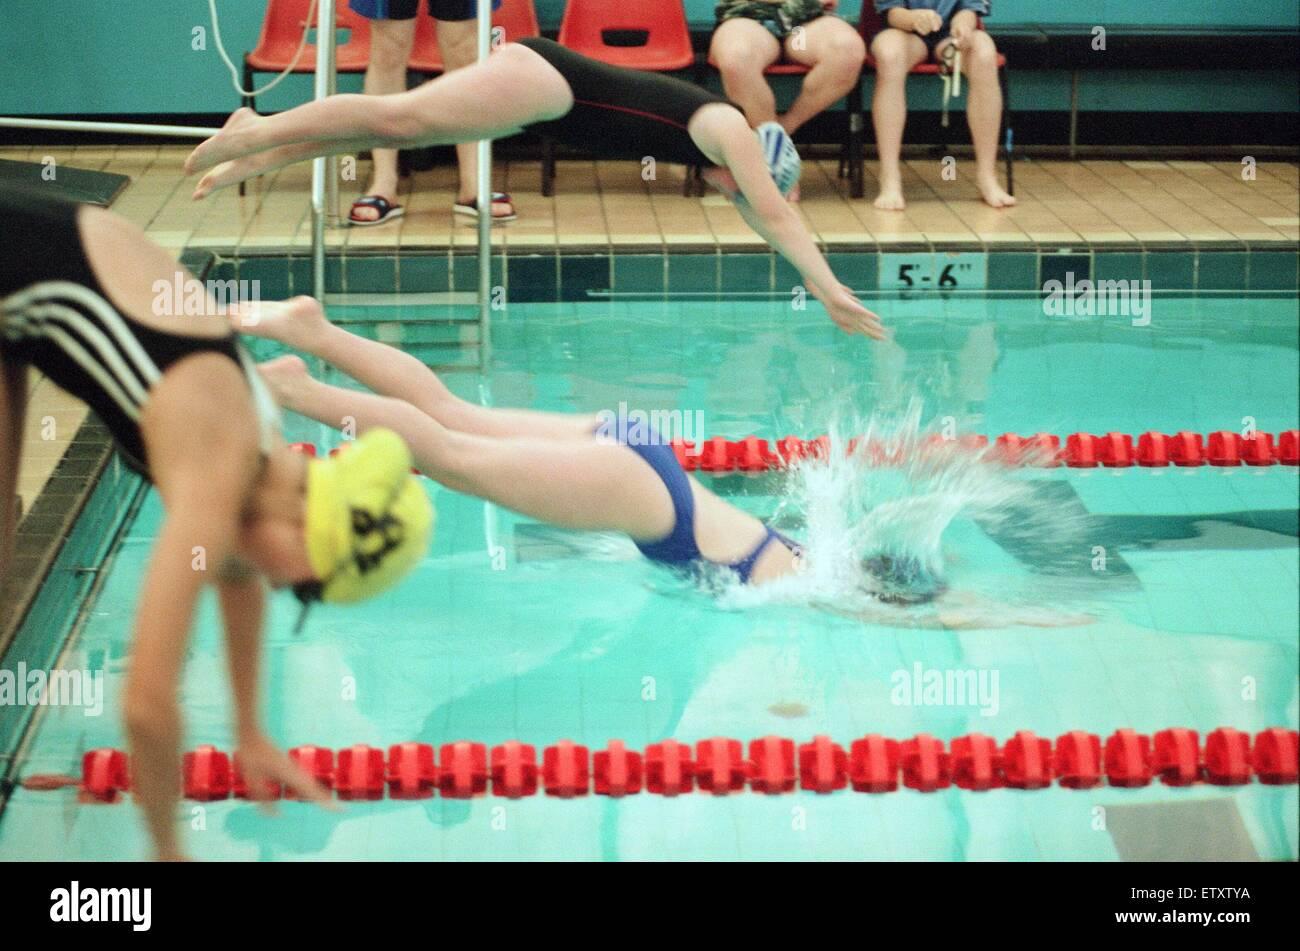 Action at the Guisborough Swimming Club Gala. 16th November 1997. - Stock Image